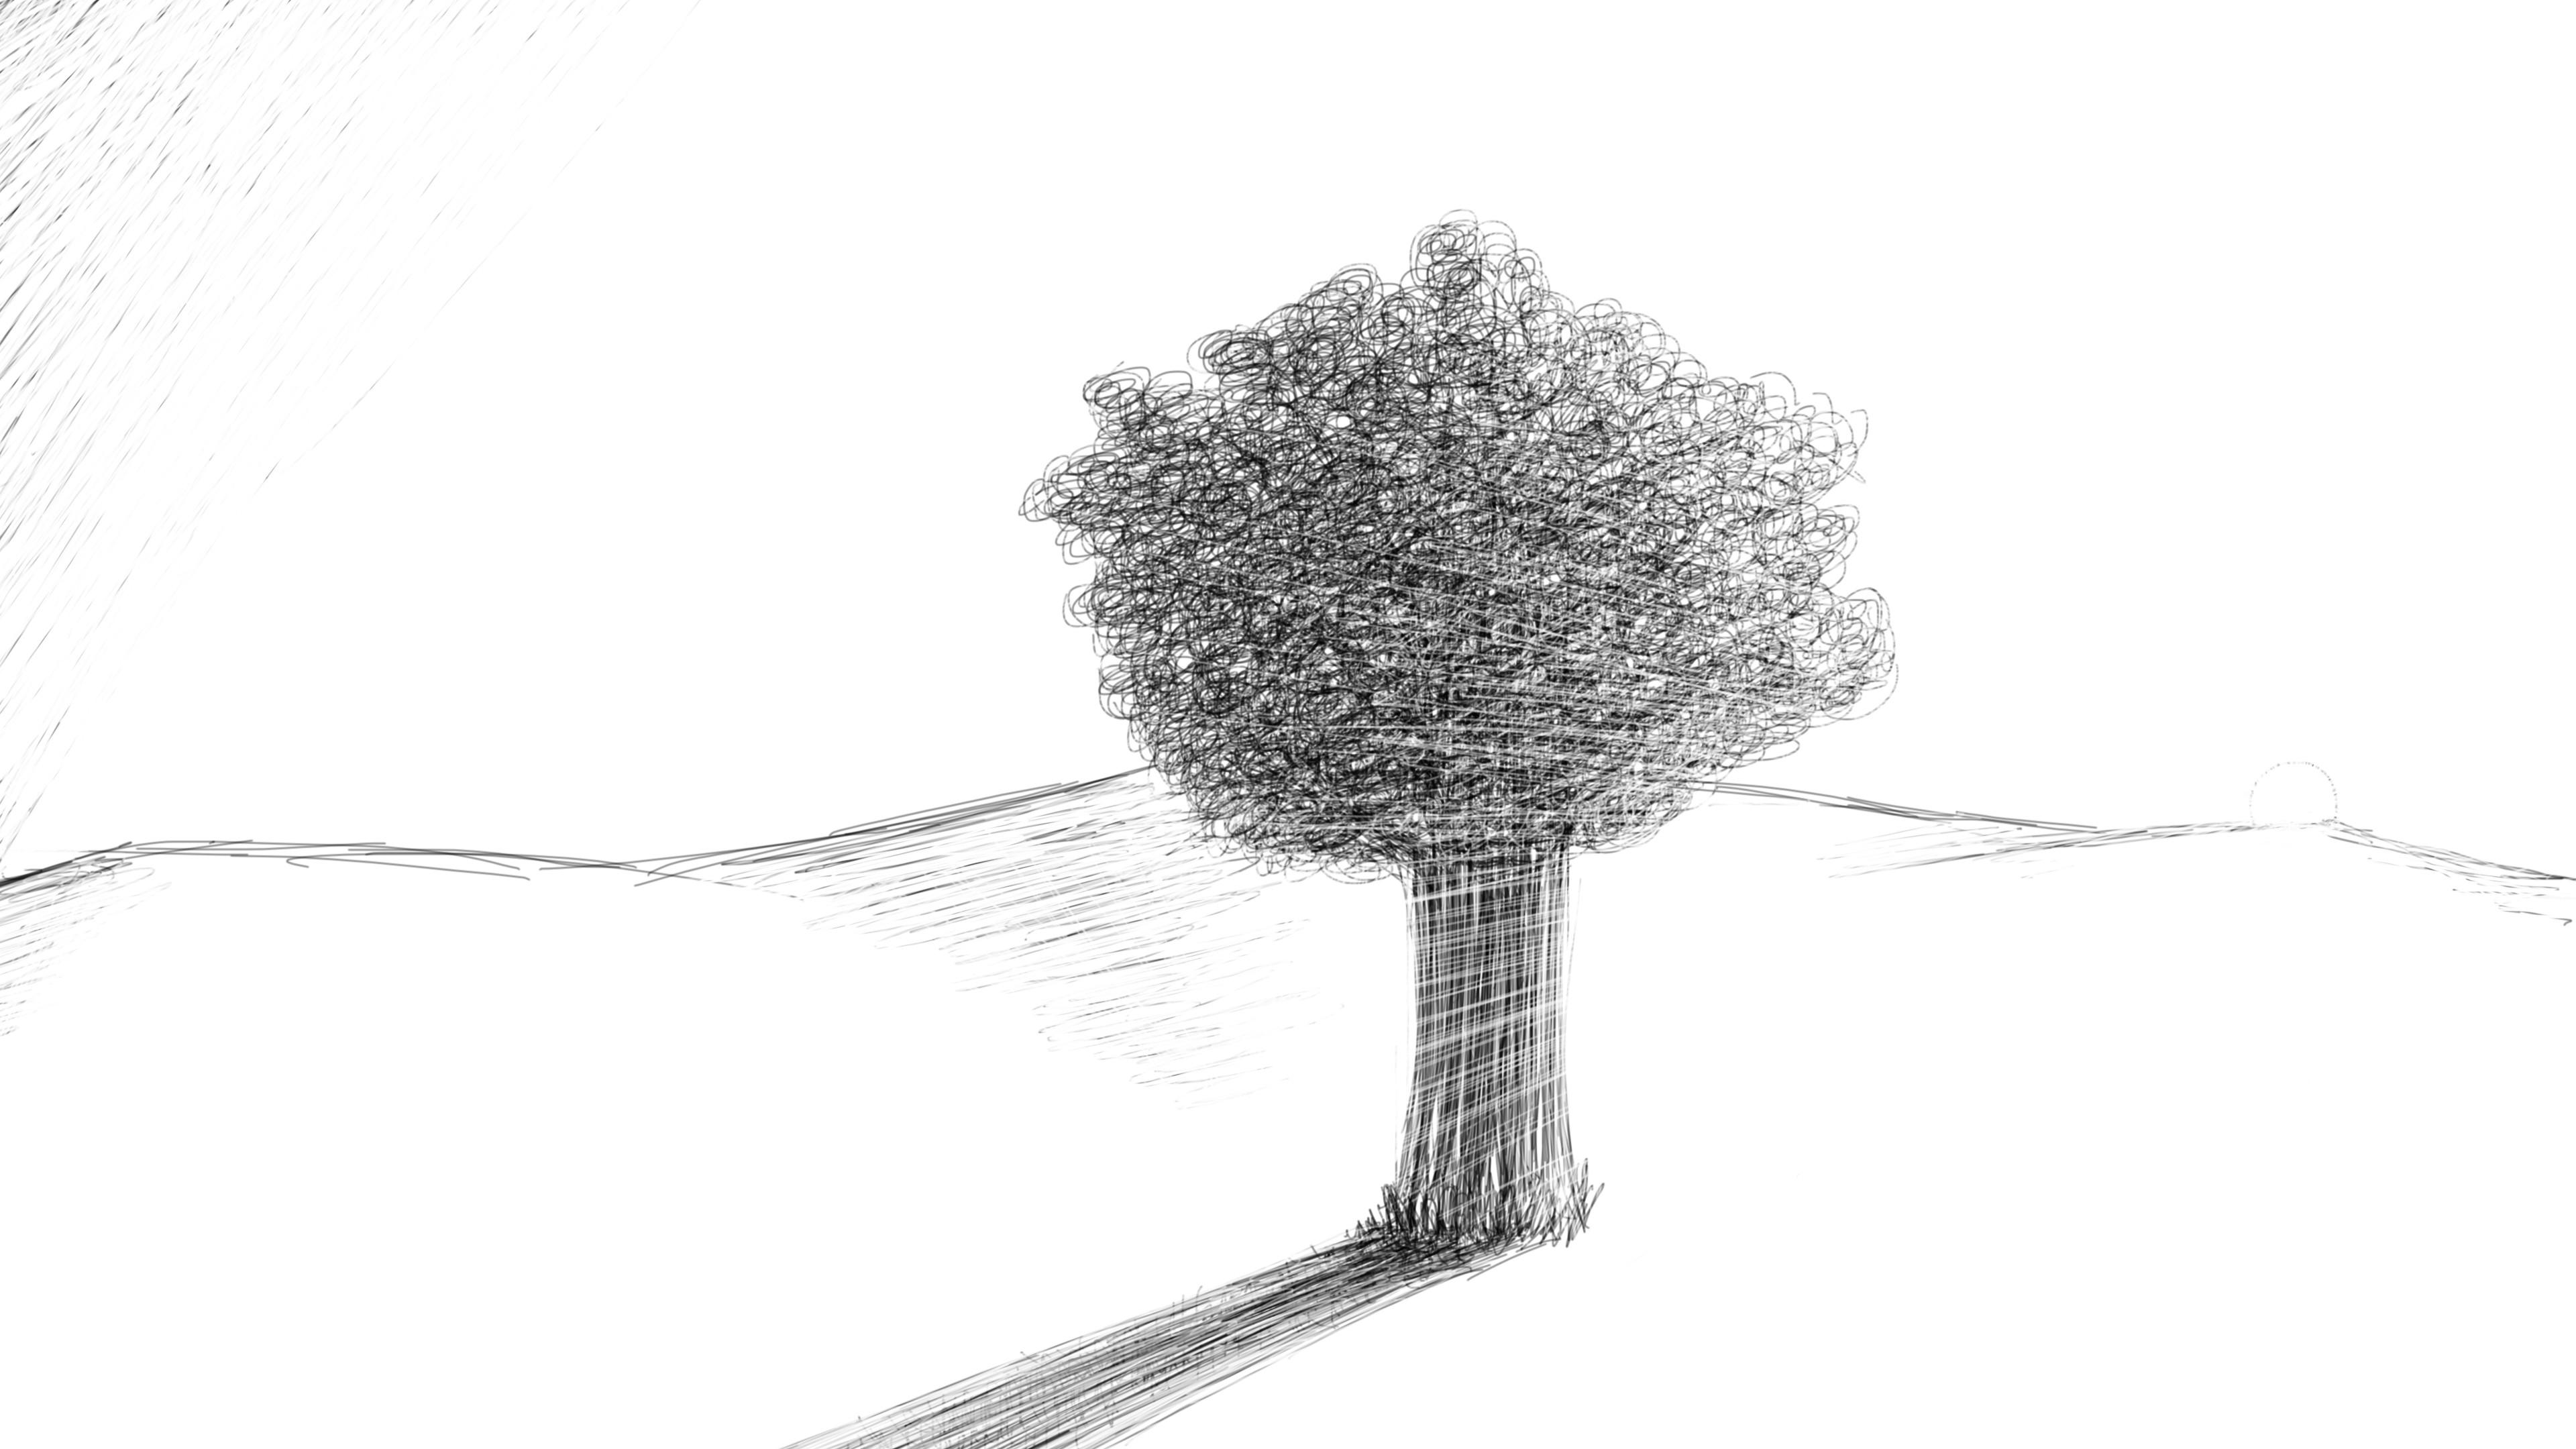 Wallpaper Pohon Pemandangan Gambar Ilustrasi Minimalis